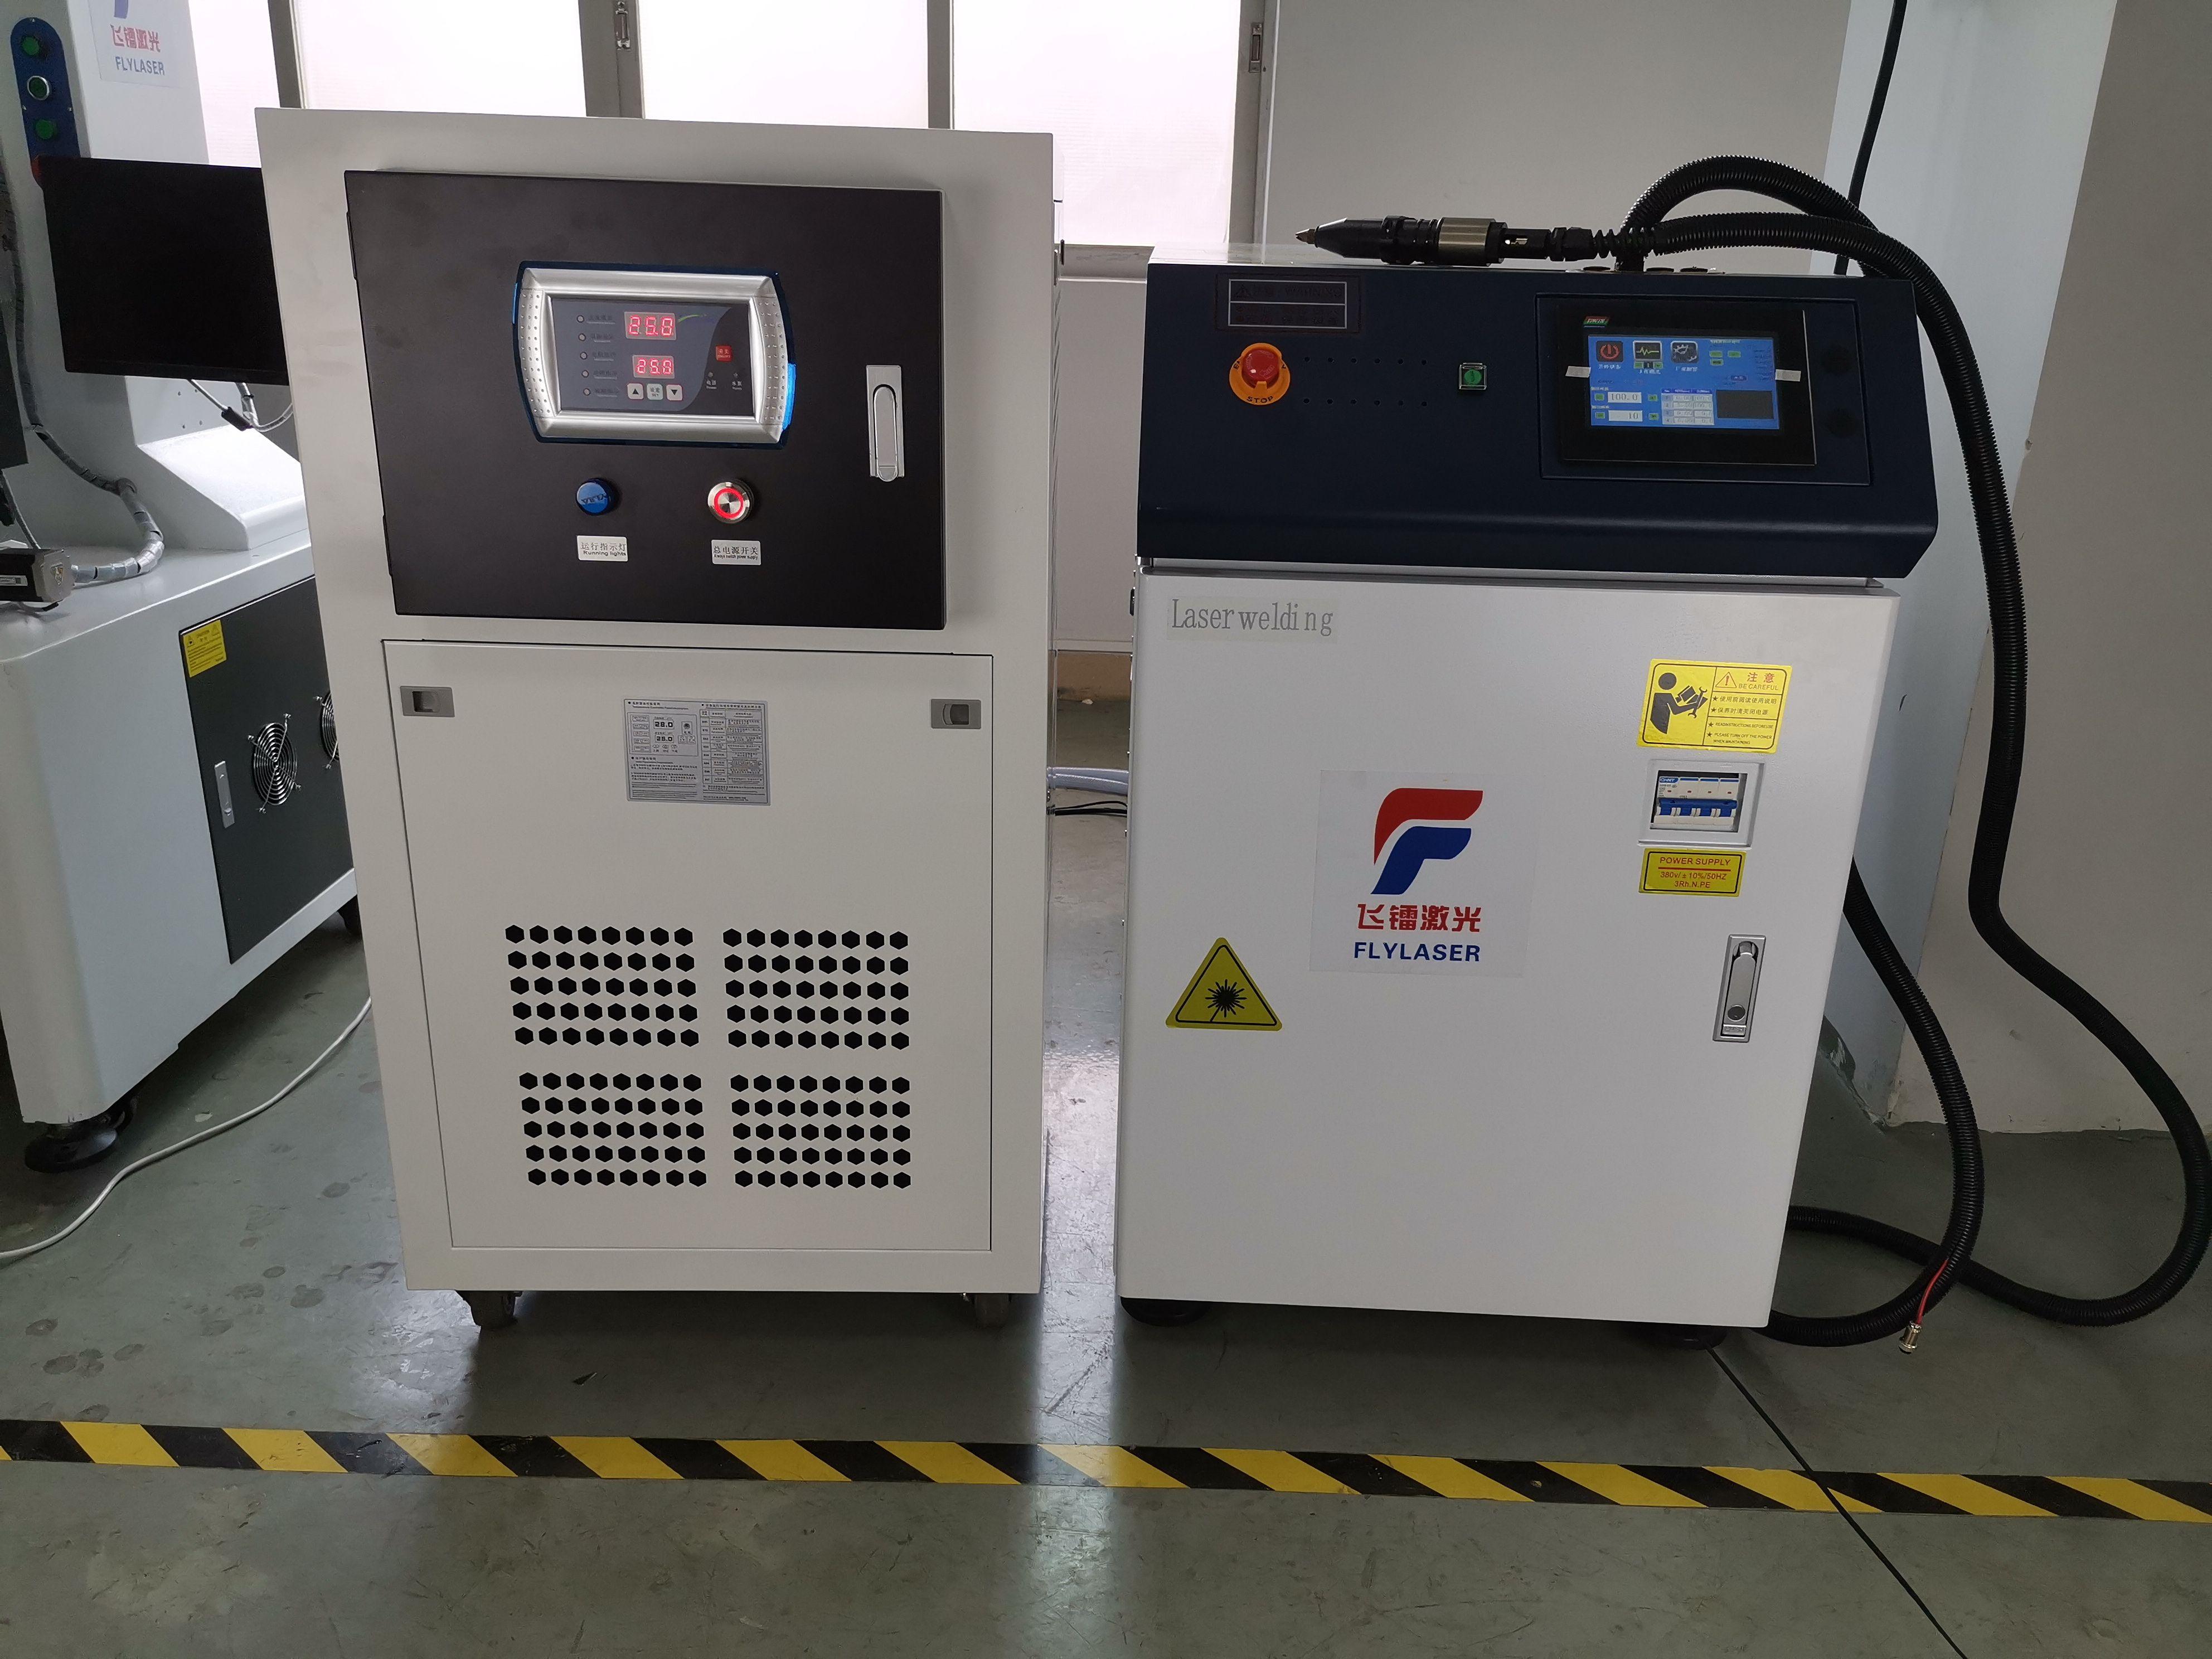 Fly Laser 200w Handheld Laser Welding Machine For Special